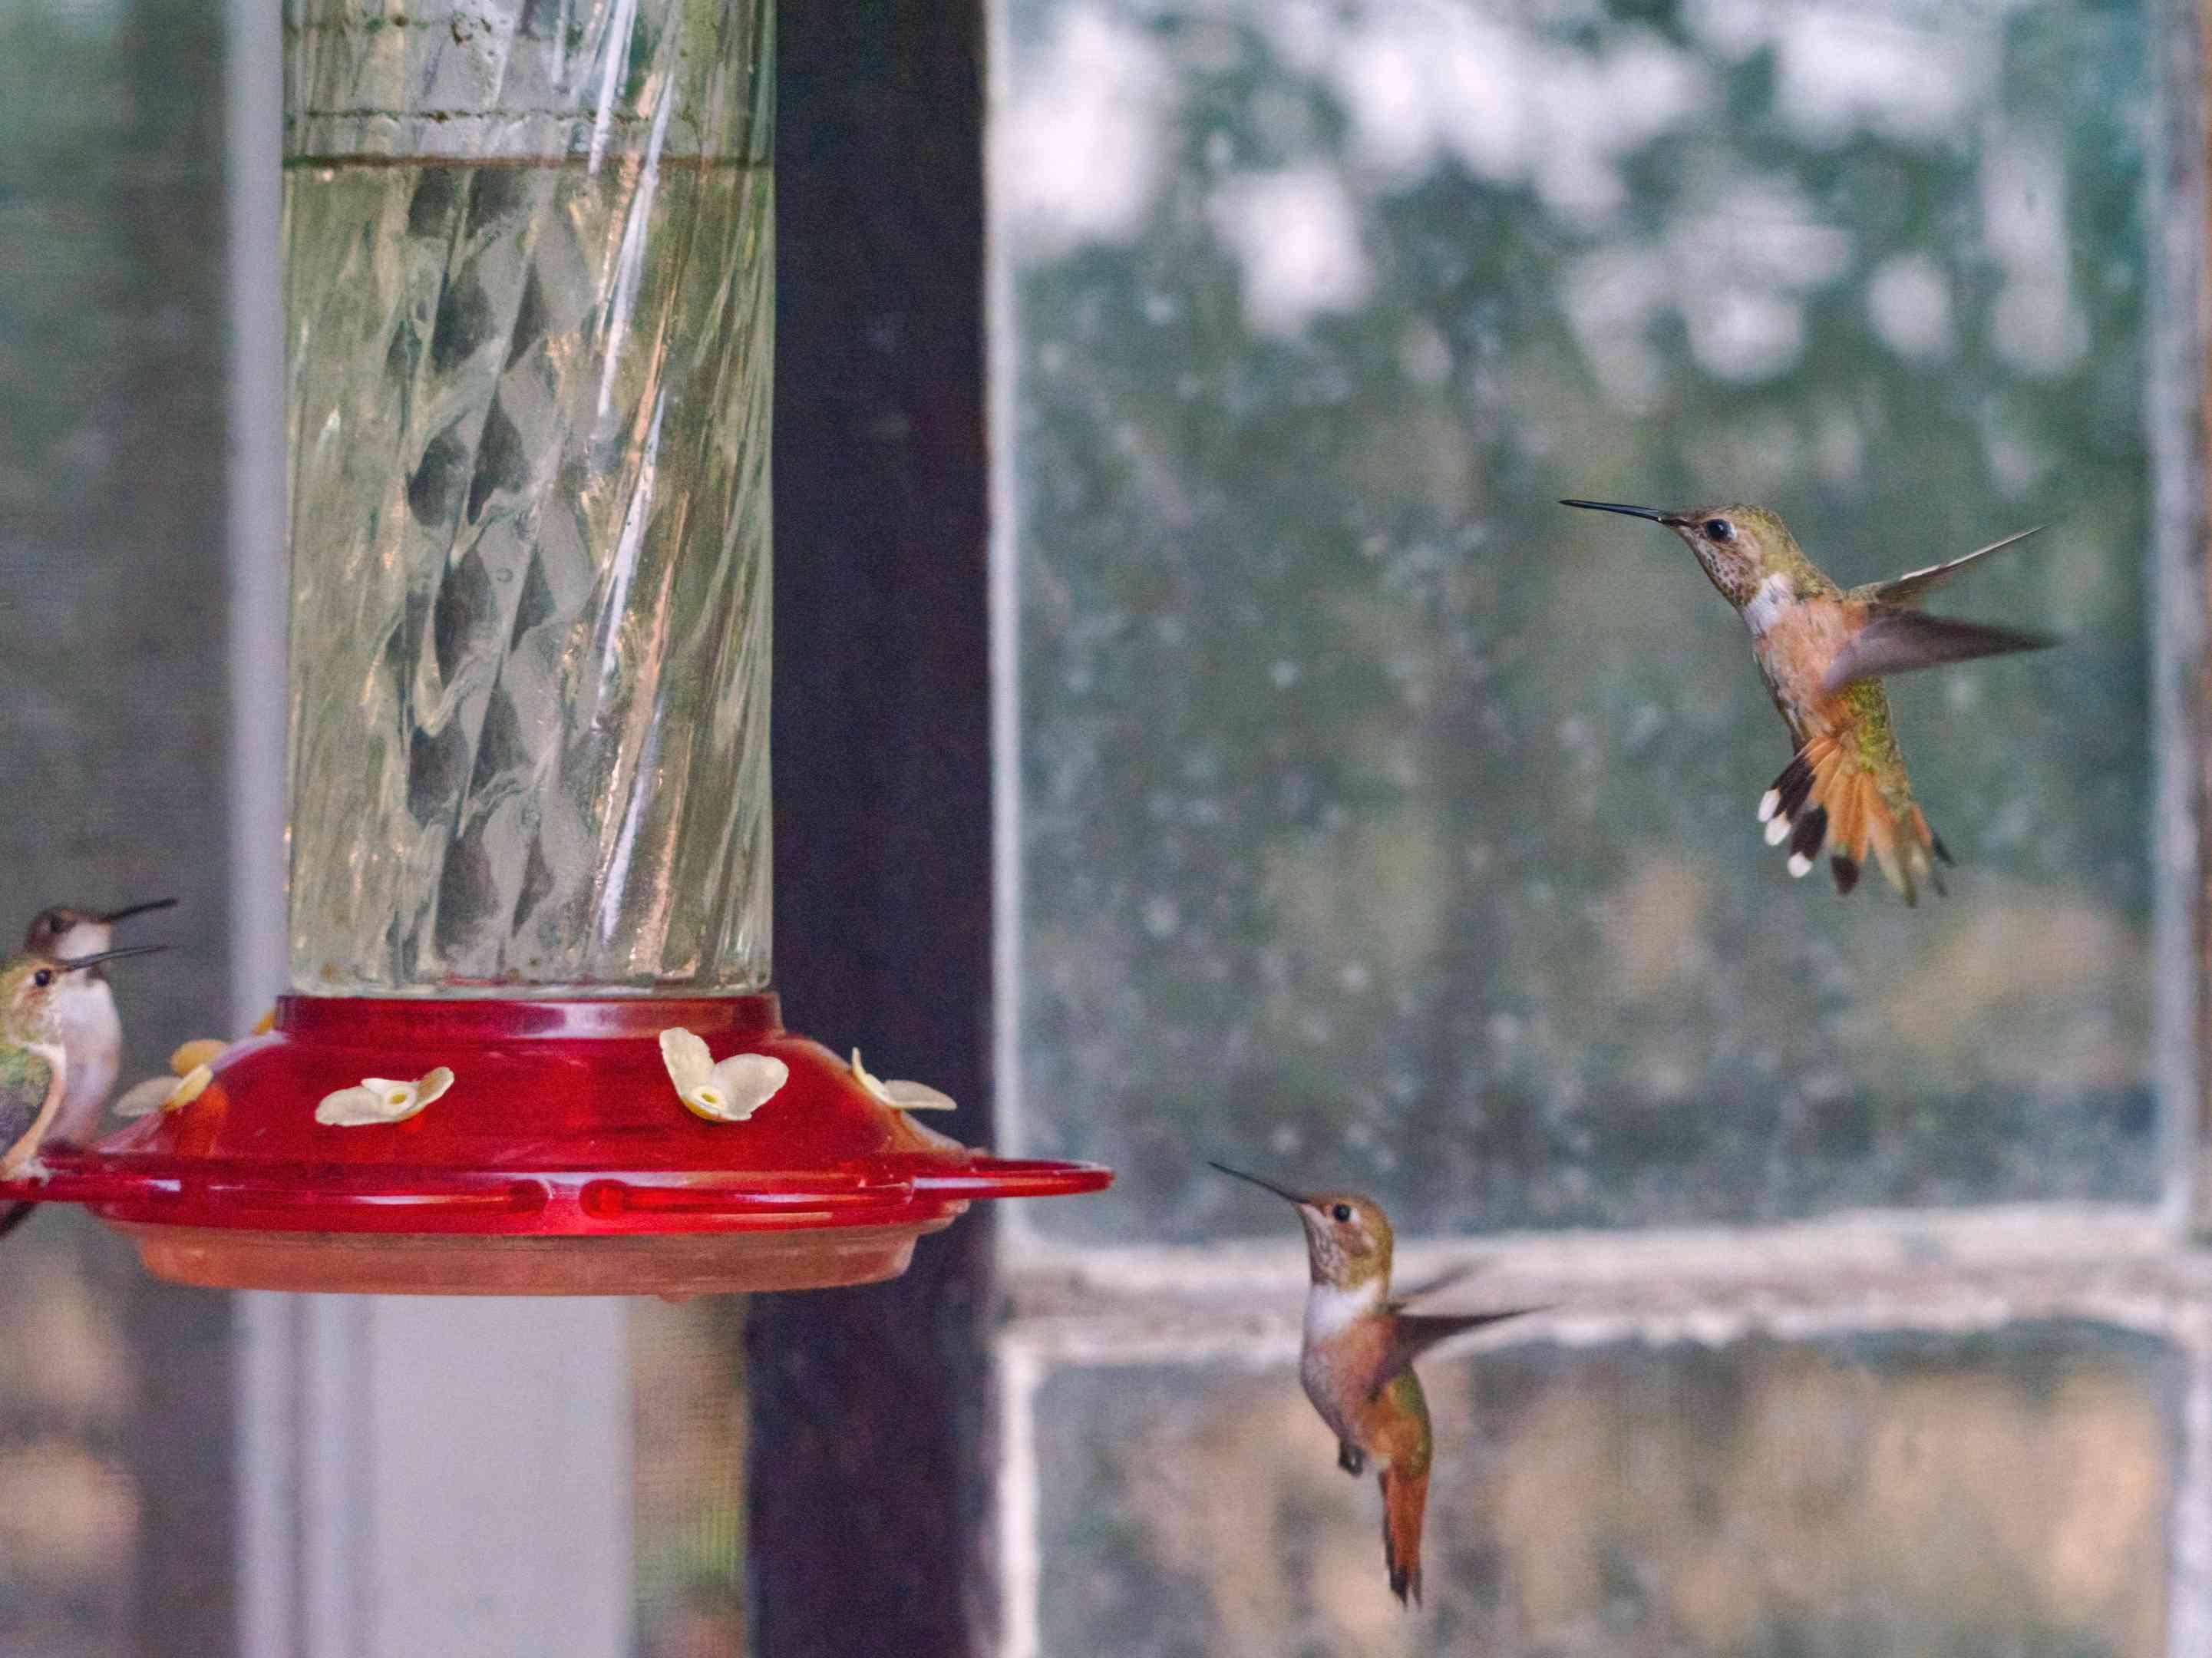 three hummingbirds crowd around plastic hummingbird feeder near window